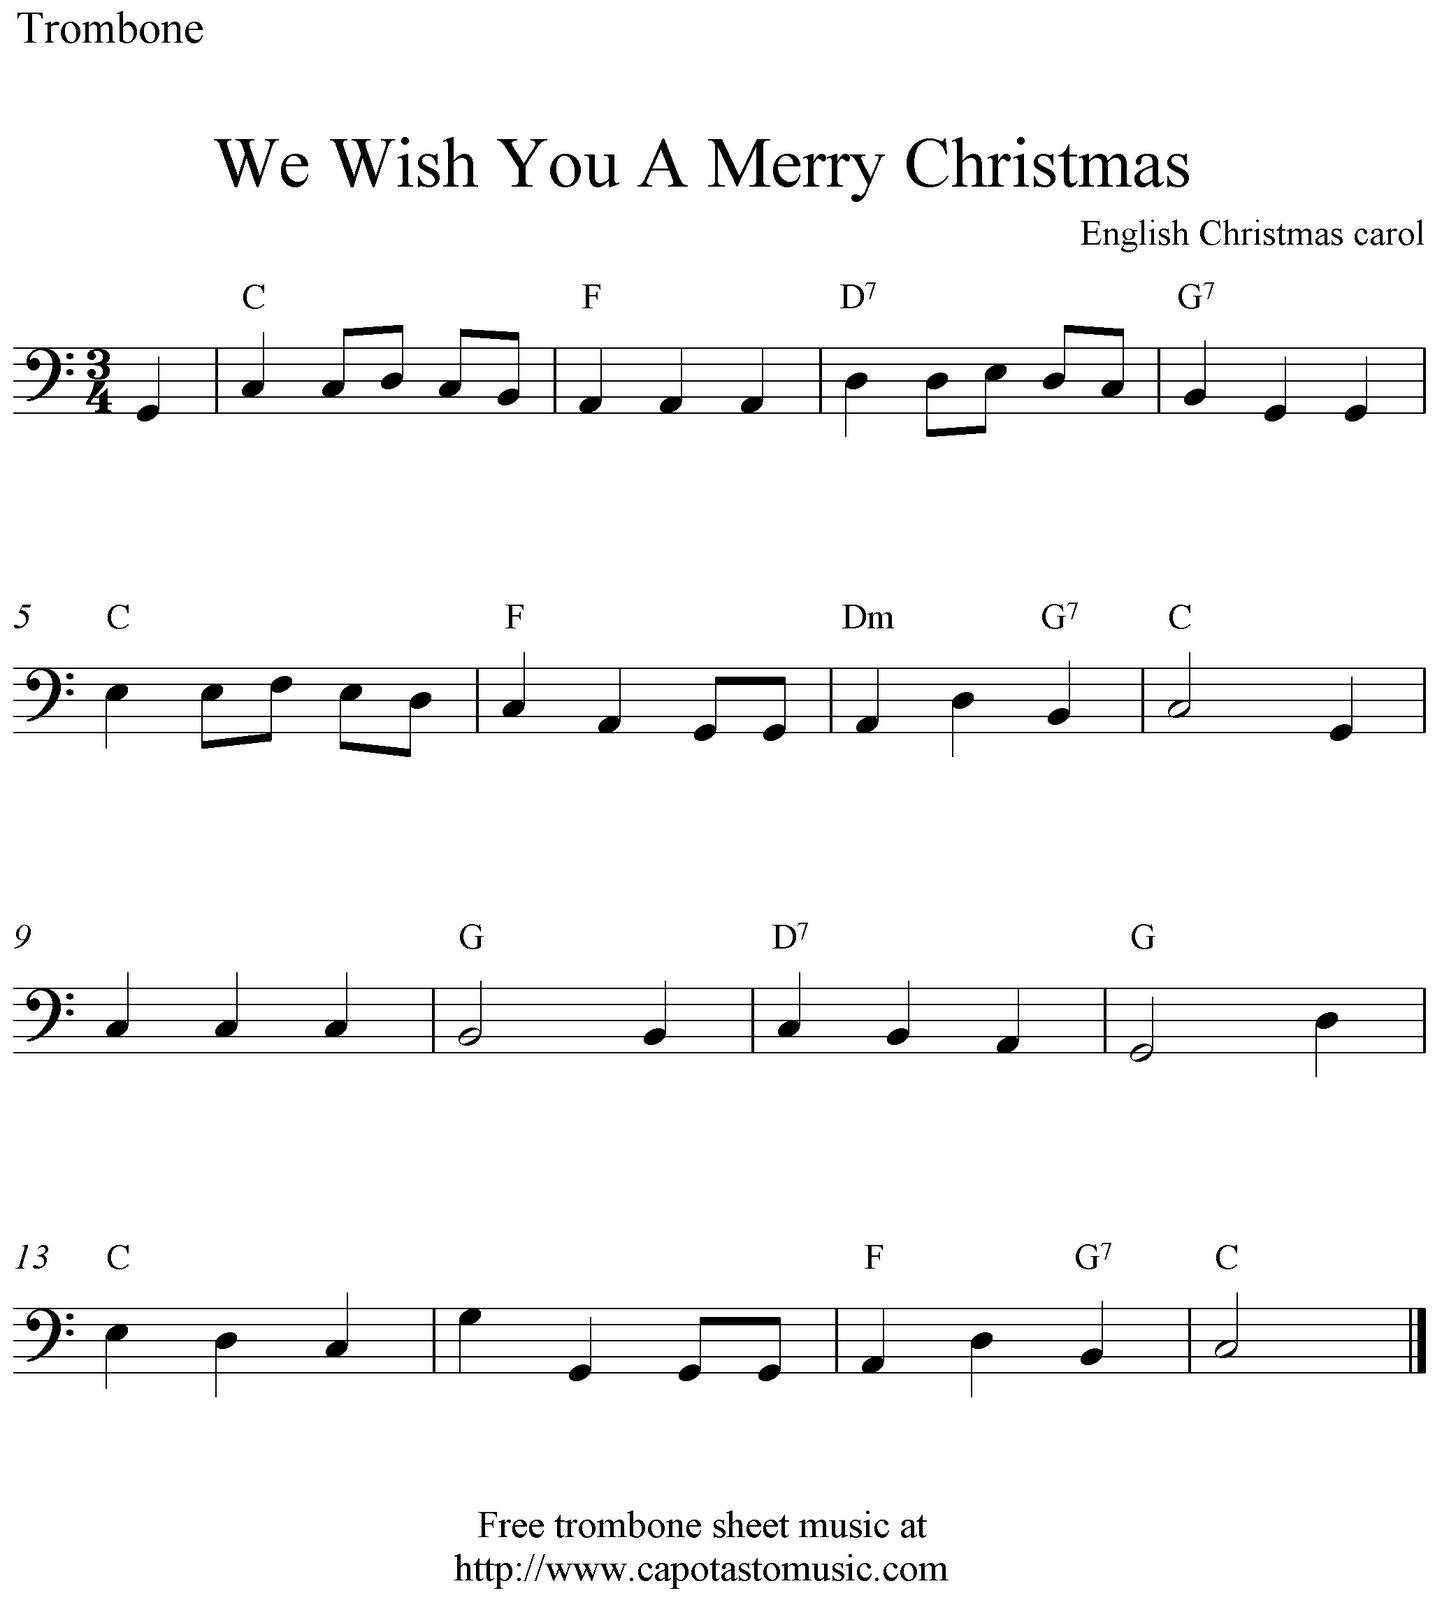 Free Sheet Music Scores Free Christmas Piano Sheet Music We Wish You A Merry Christmas Viola Sheet Music Christmas Sheet Music Sheet Music